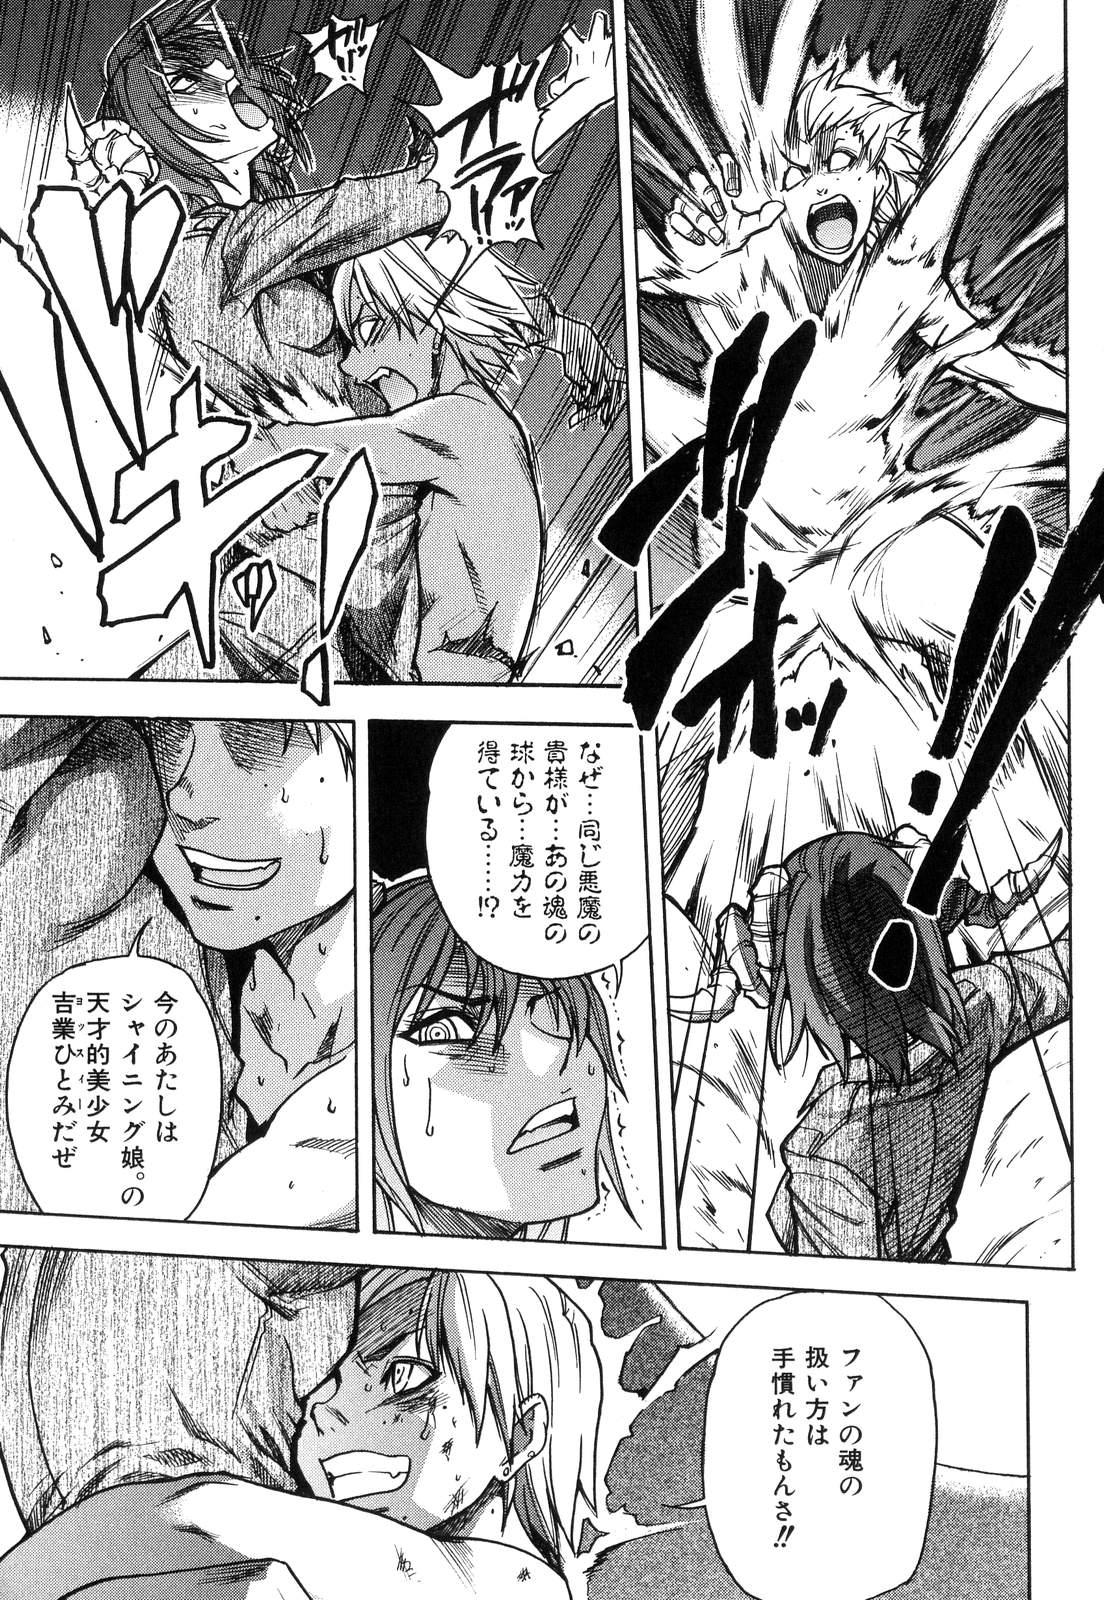 Shining Musume. 6. Rainbow Six 204